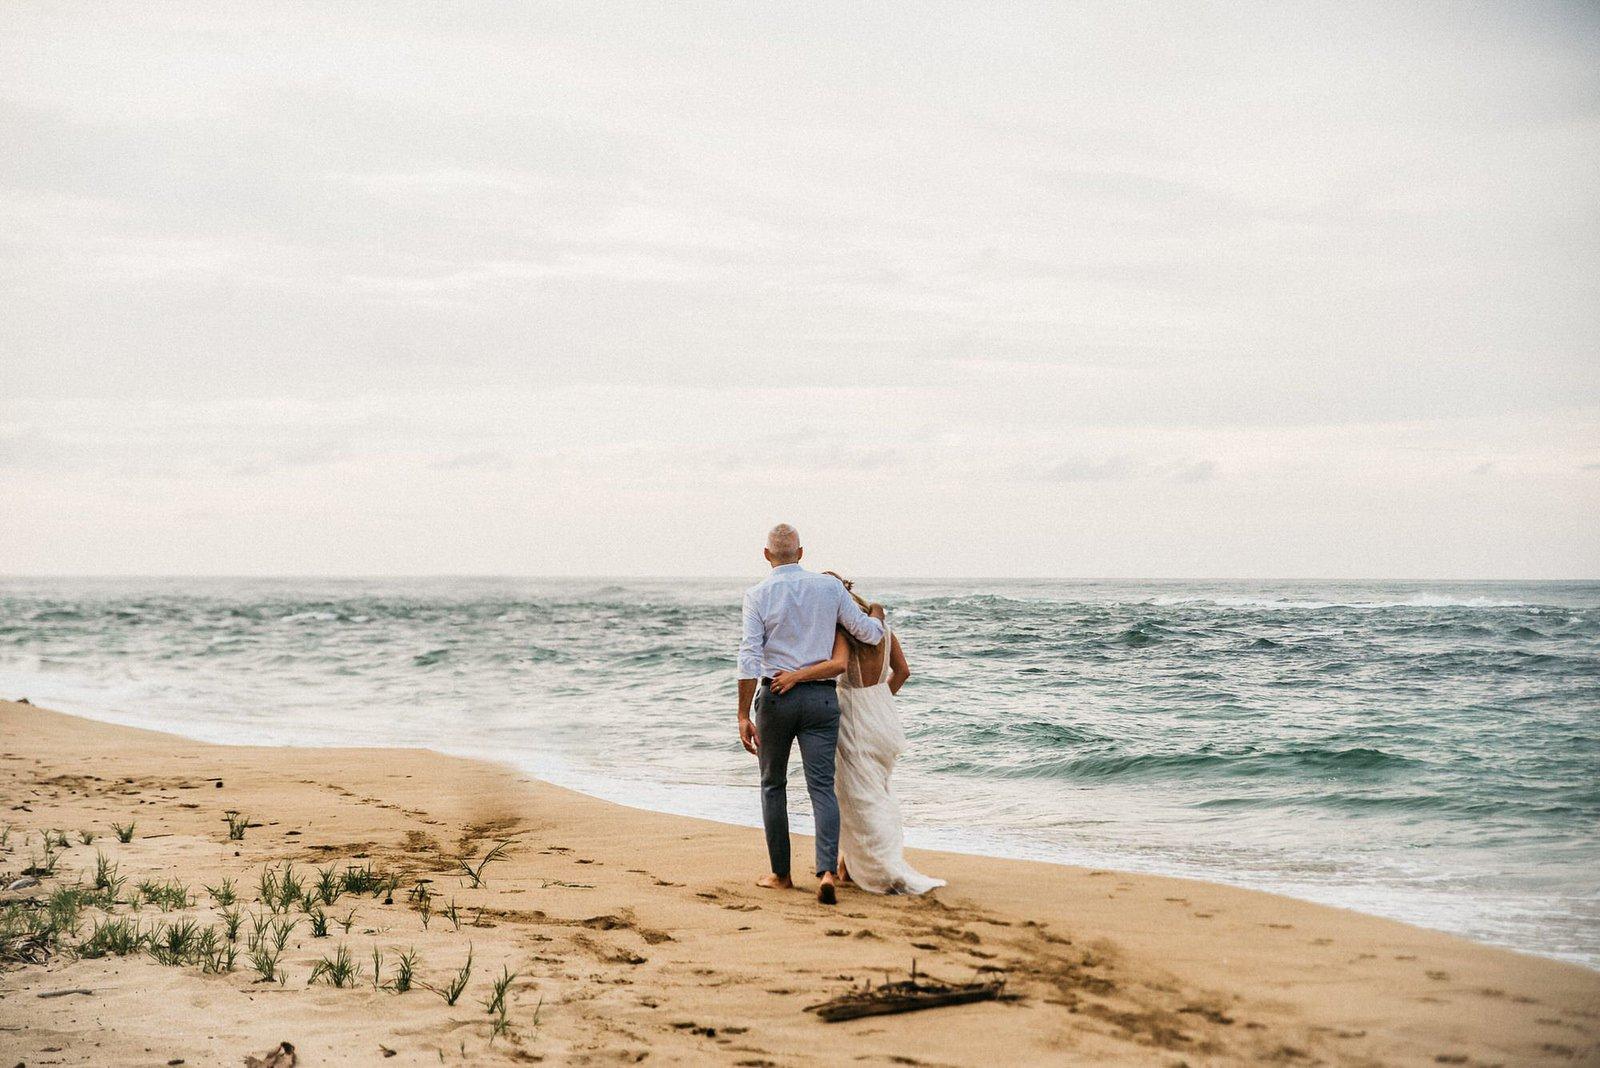 beach walks for bride and groom.